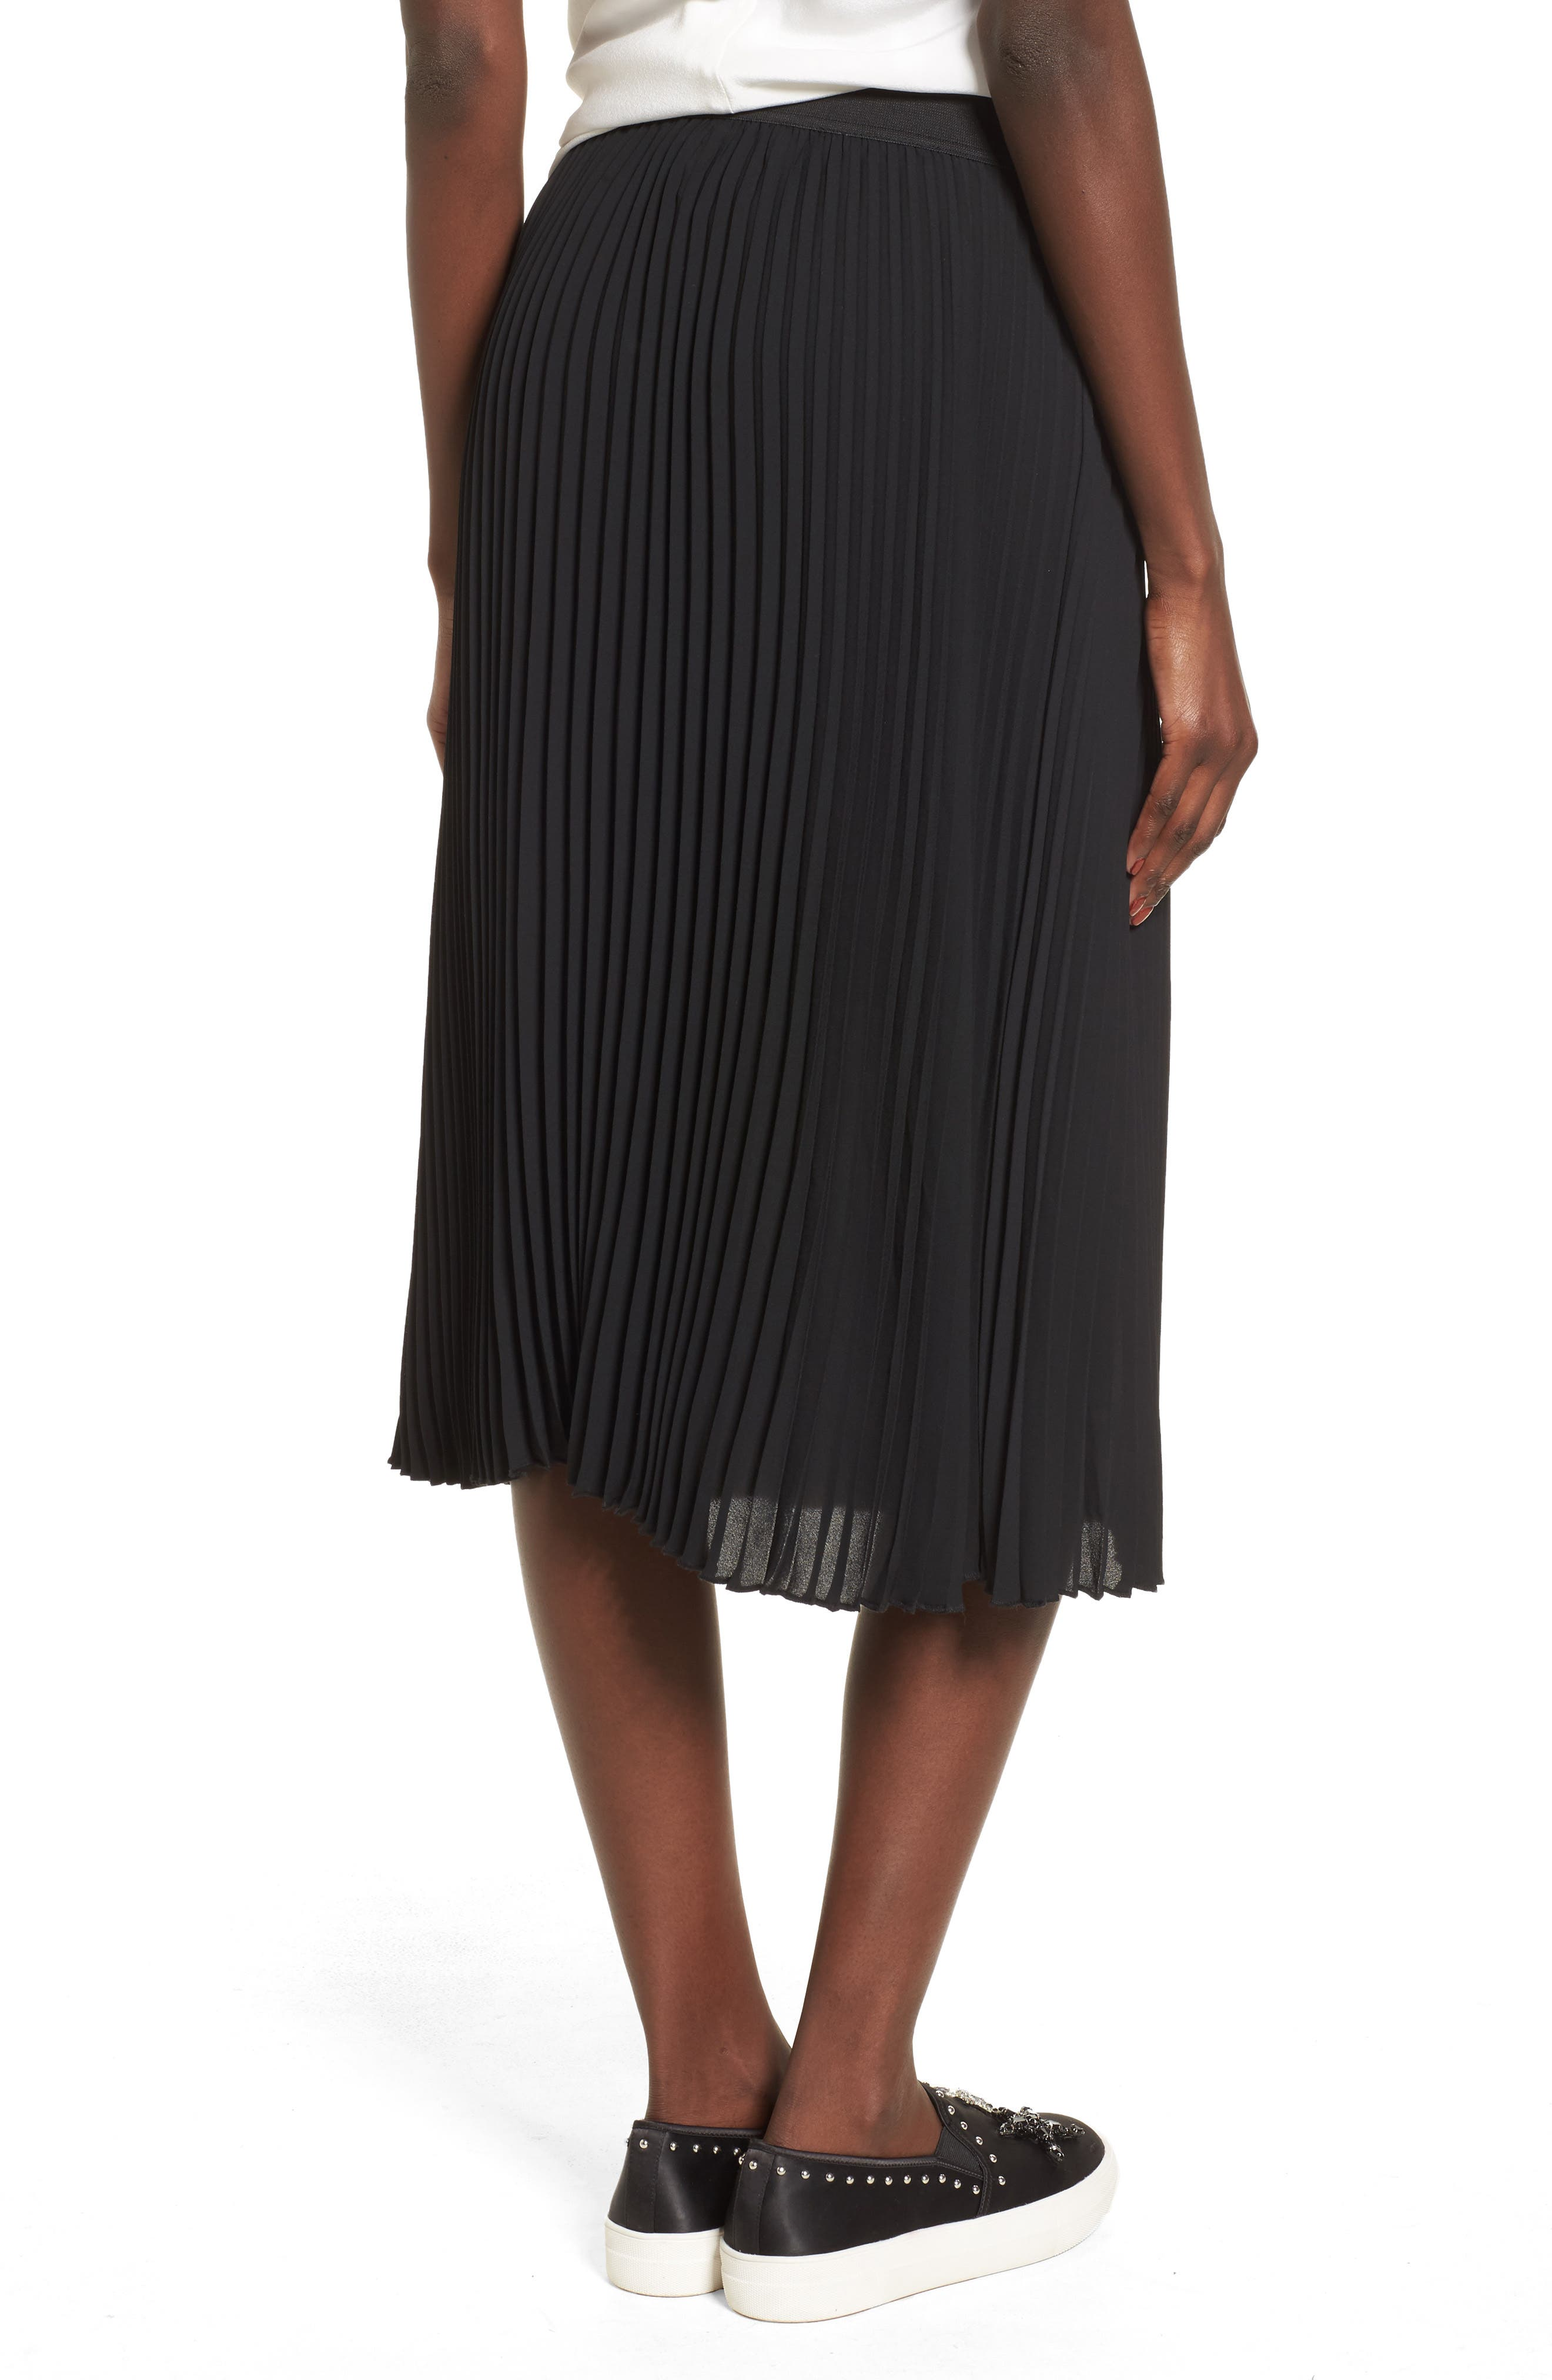 BP. Apparel Skirts: A-Line, Pencil, Maxi, Miniskirts & More ...